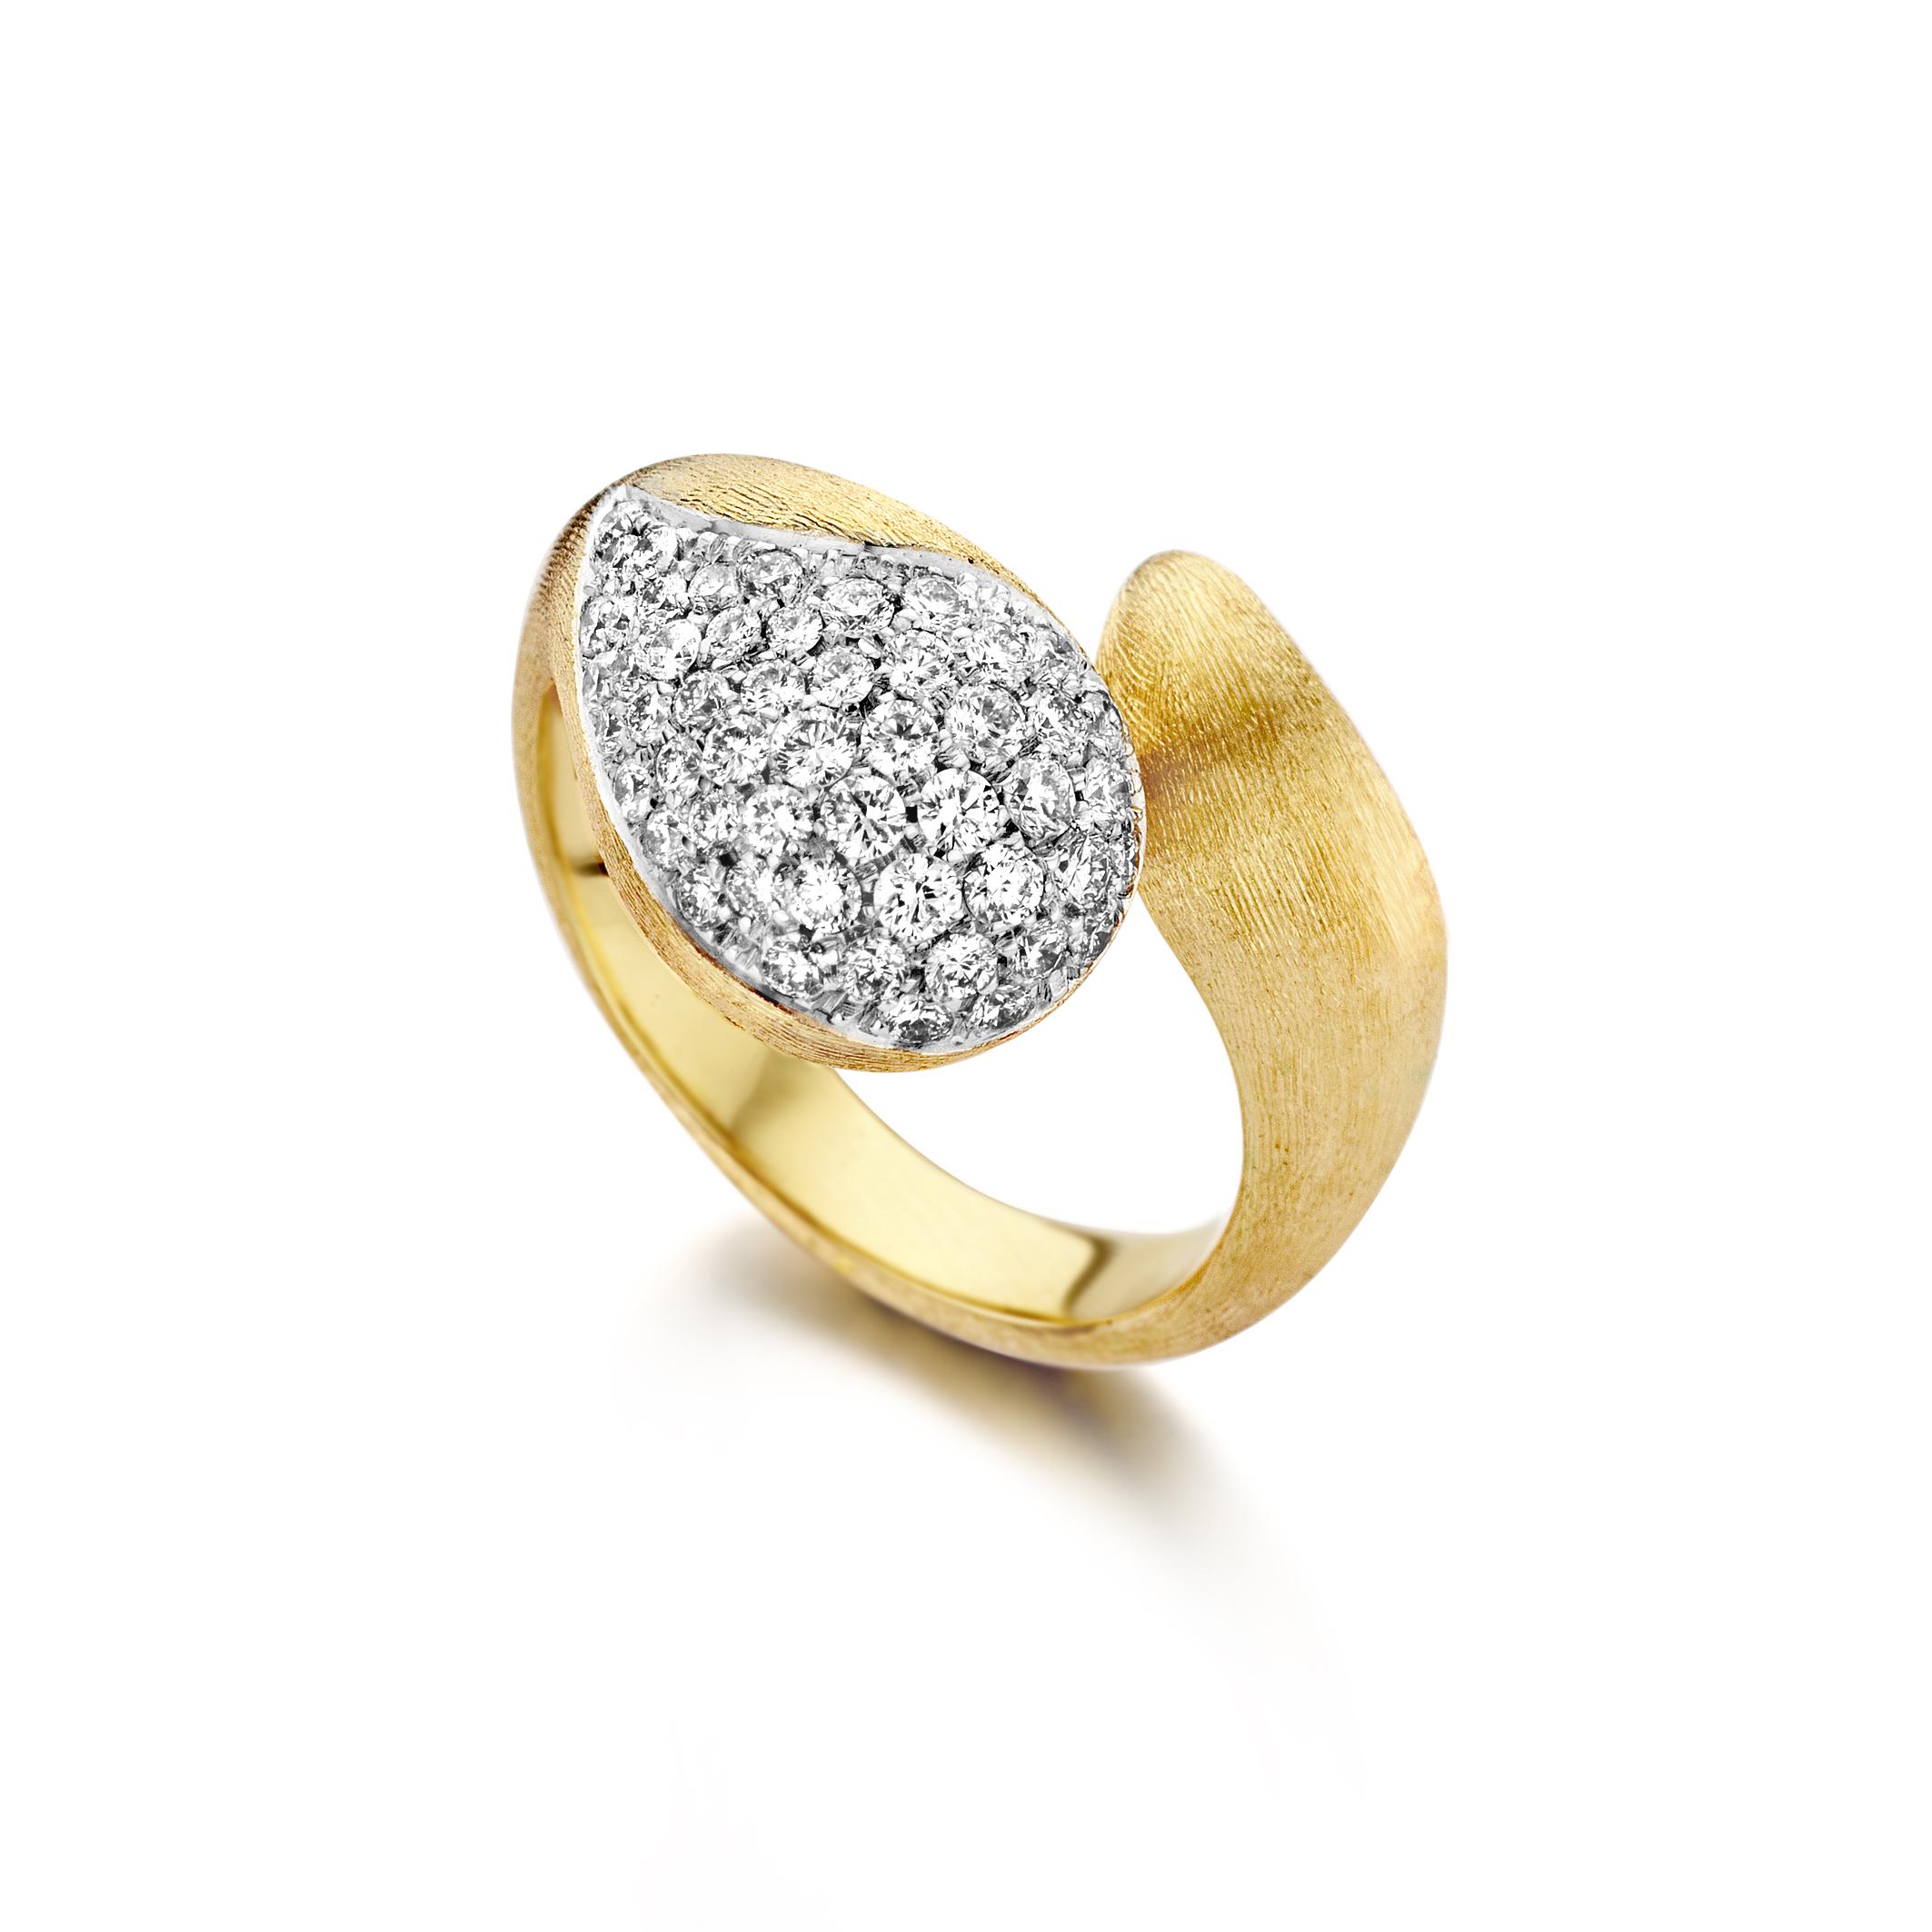 Nanis Ring | Ventura Jewelers | Van Gundys